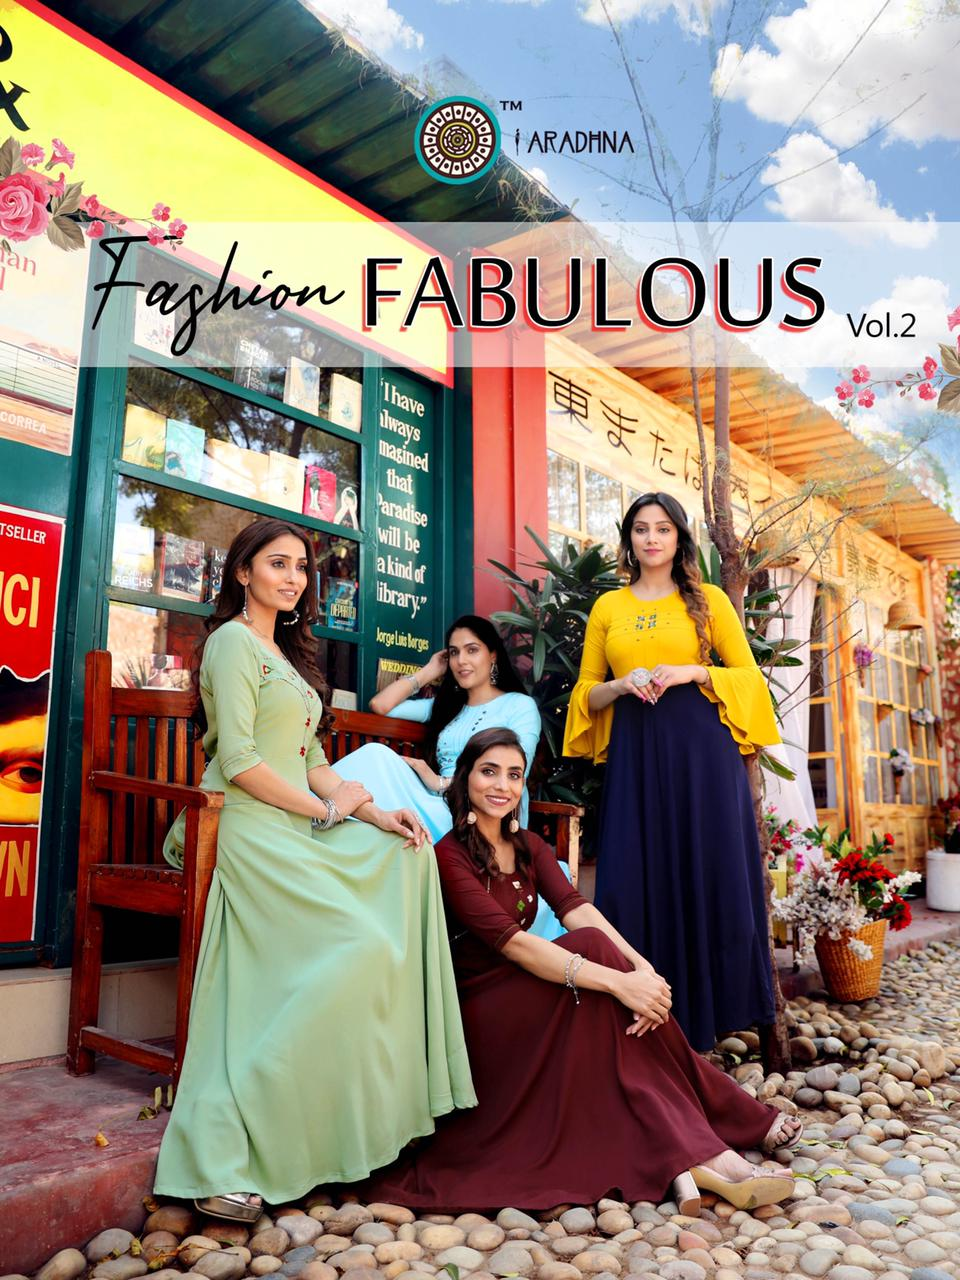 Aradhna Fashion Fabulous Vol 2 Kurti Wholesale Catalog 12 Pcs 2 - Aradhna Fashion Fabulous Vol 2 Kurti Wholesale Catalog 12 Pcs